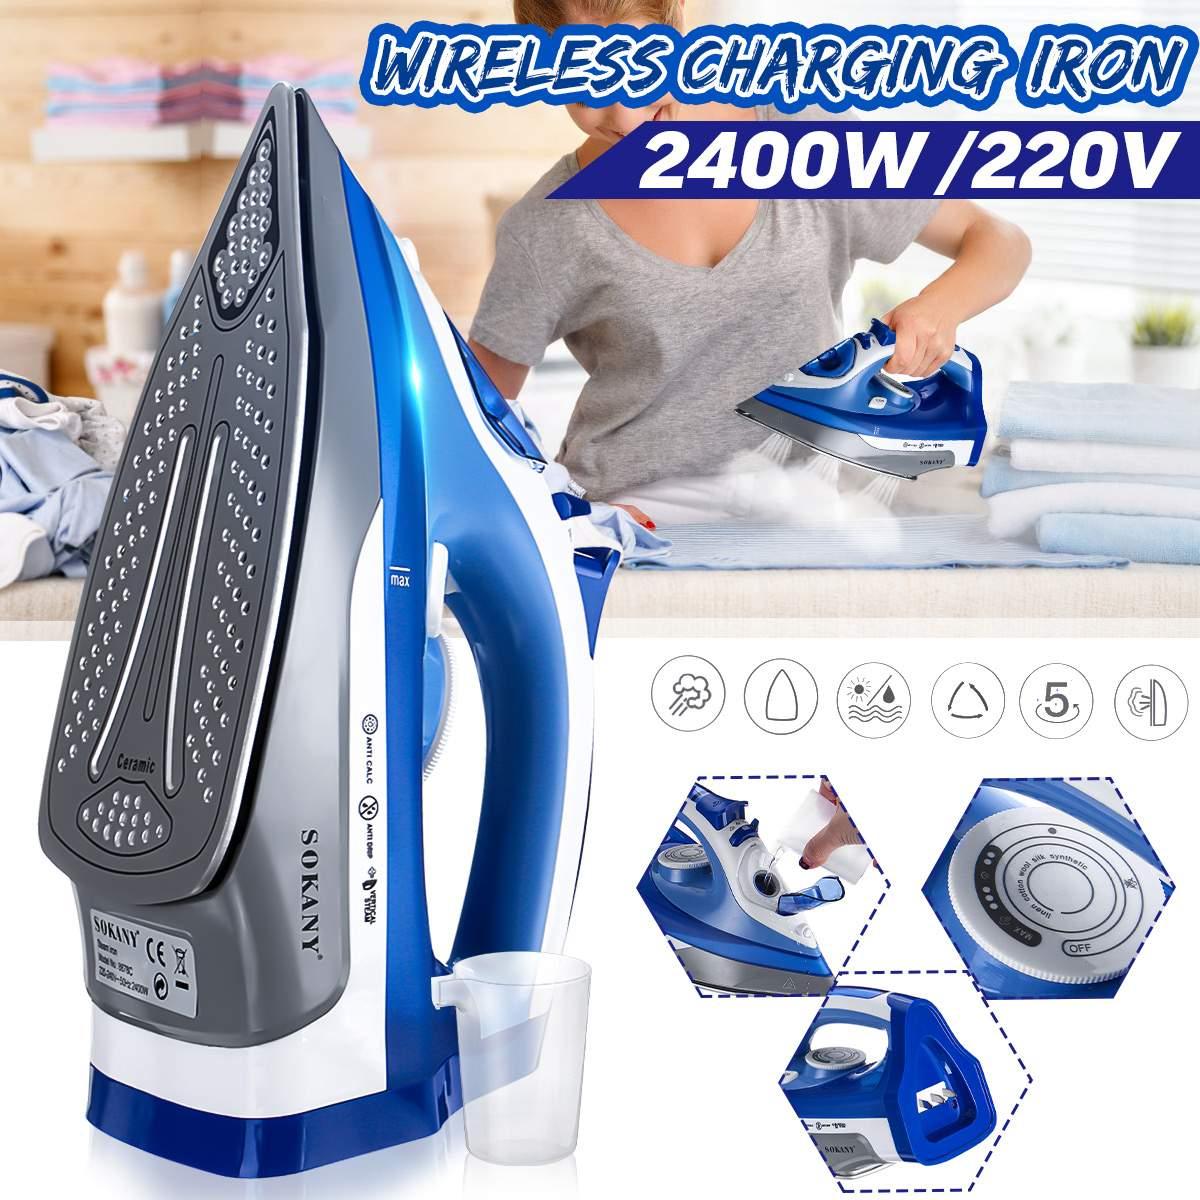 2400W Cordless Electric Steam Iron AC 220V Ironing Machine Garment Flatiron Adjustable Thermostatic Control Non-stick Soleplate